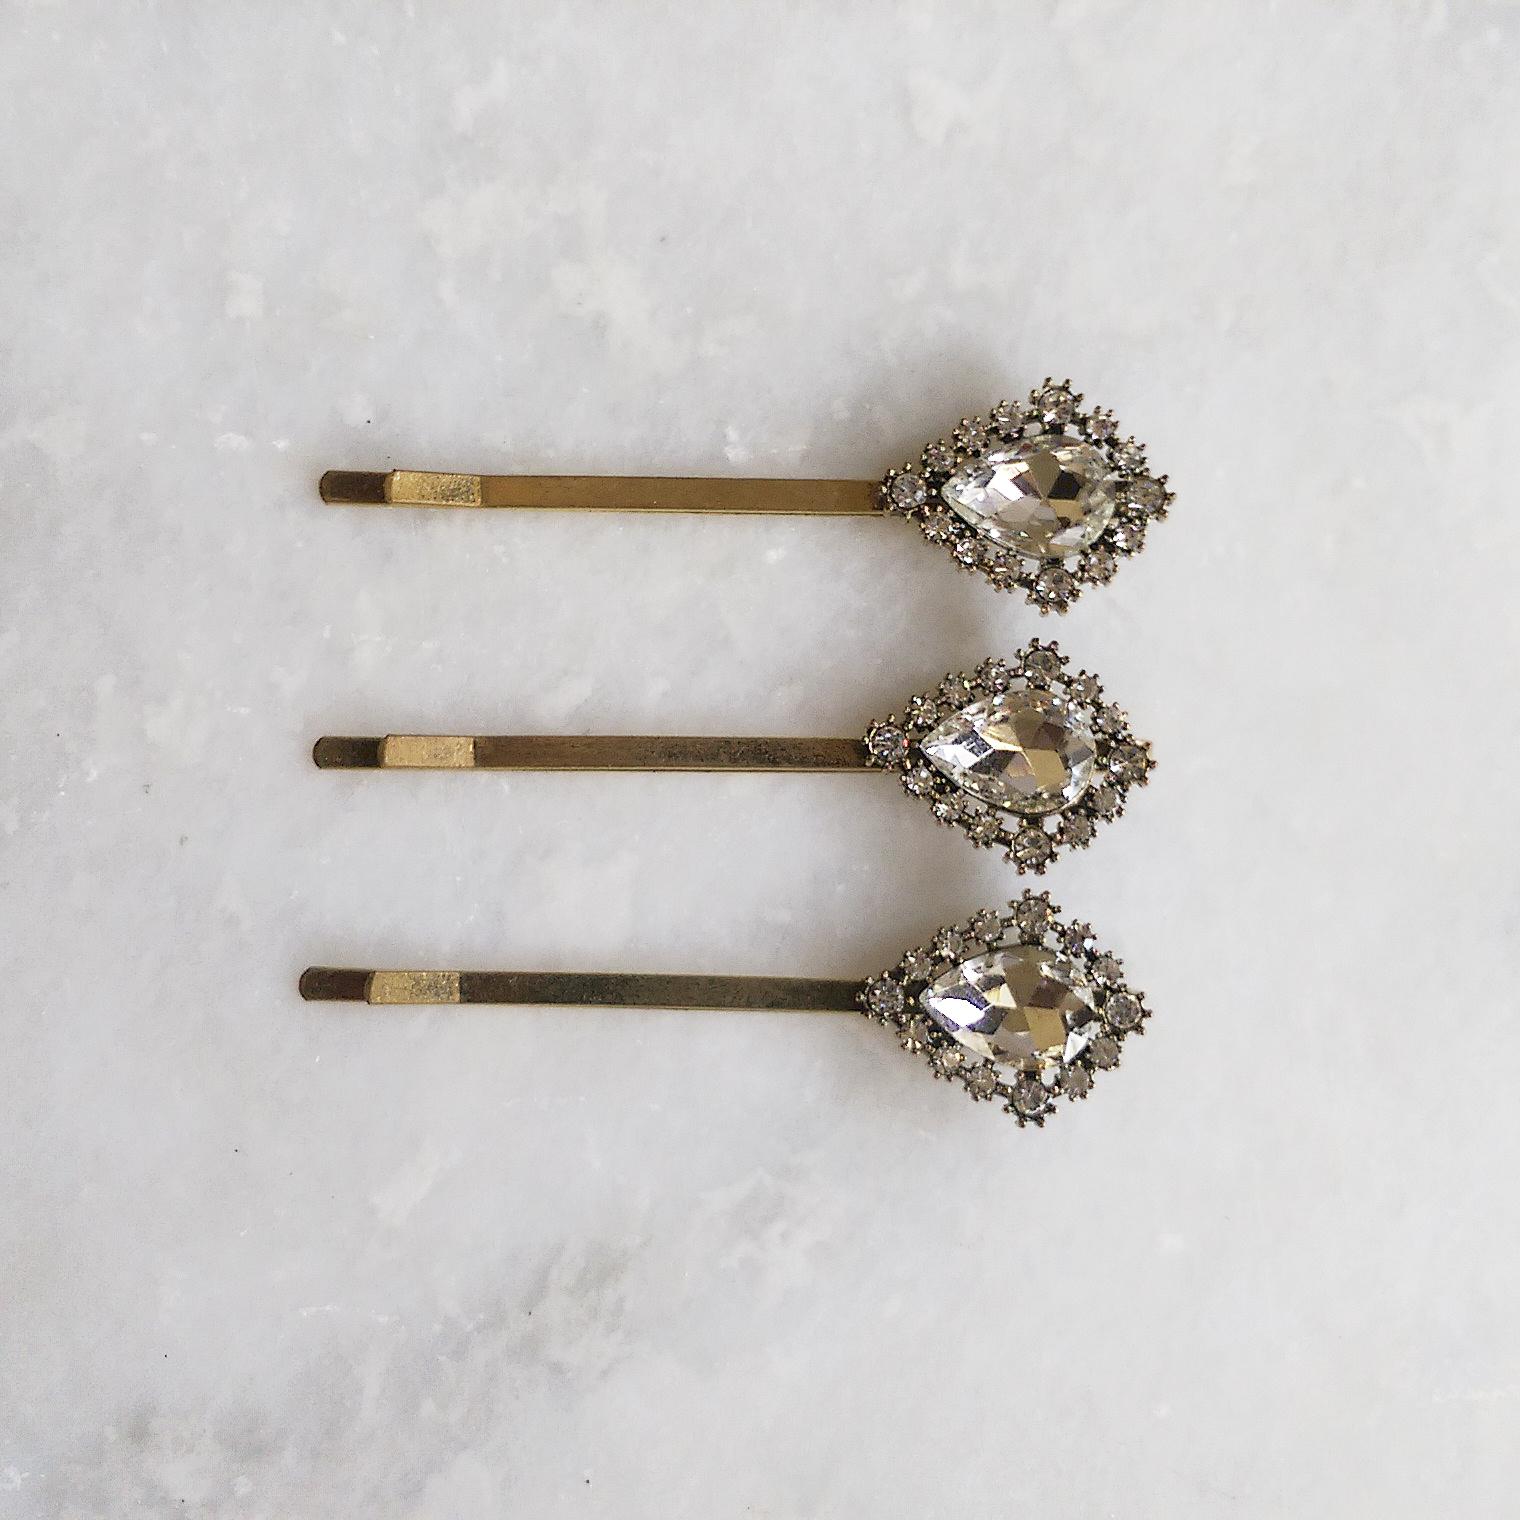 Bridal Star Hair Pins Pearl And Crystal Vintage Style Wedding Hair Accessory